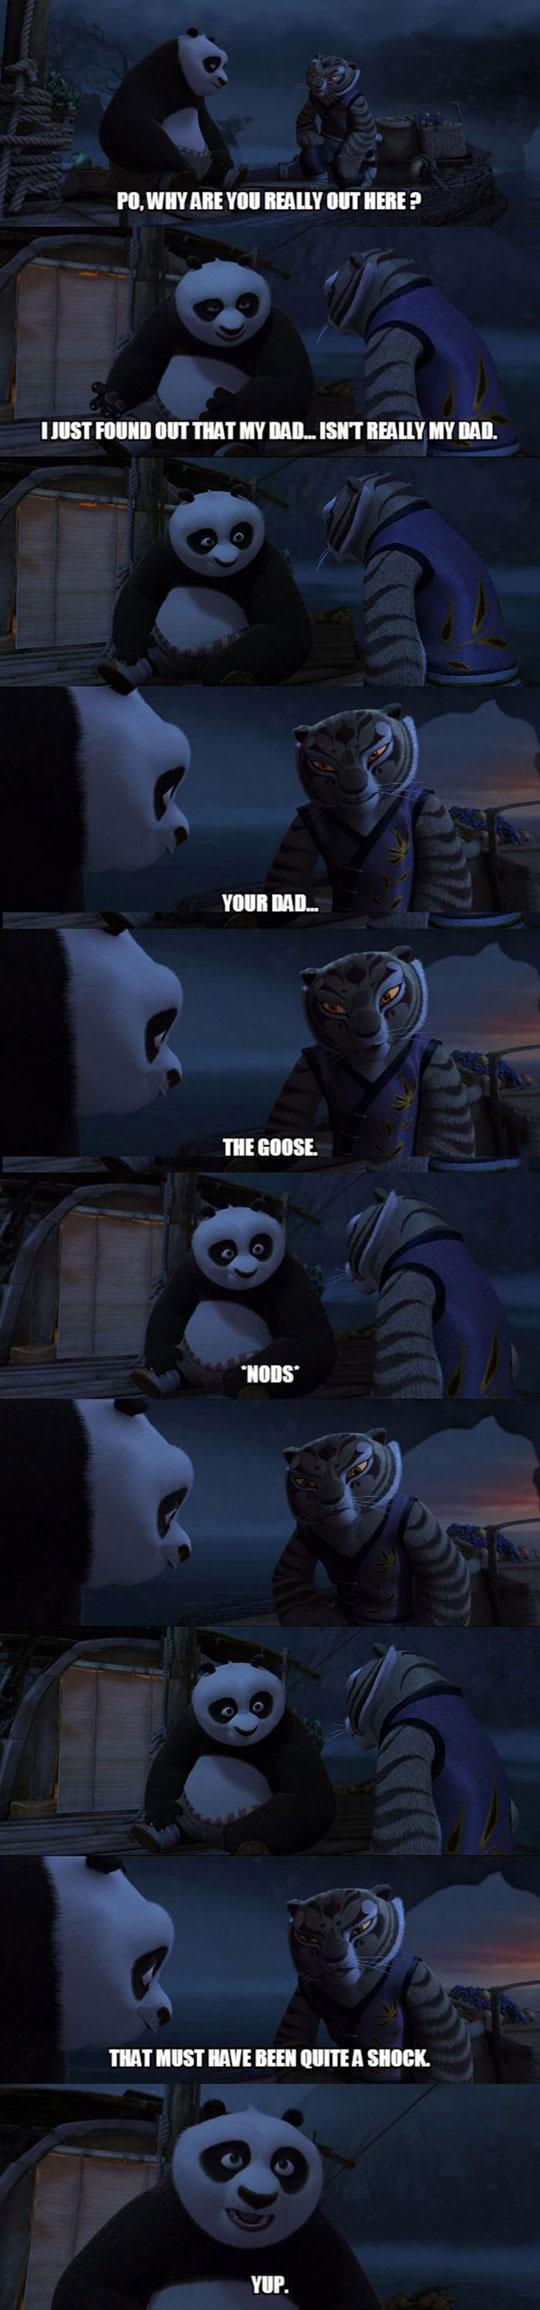 This Scene Still Makes Me Laugh